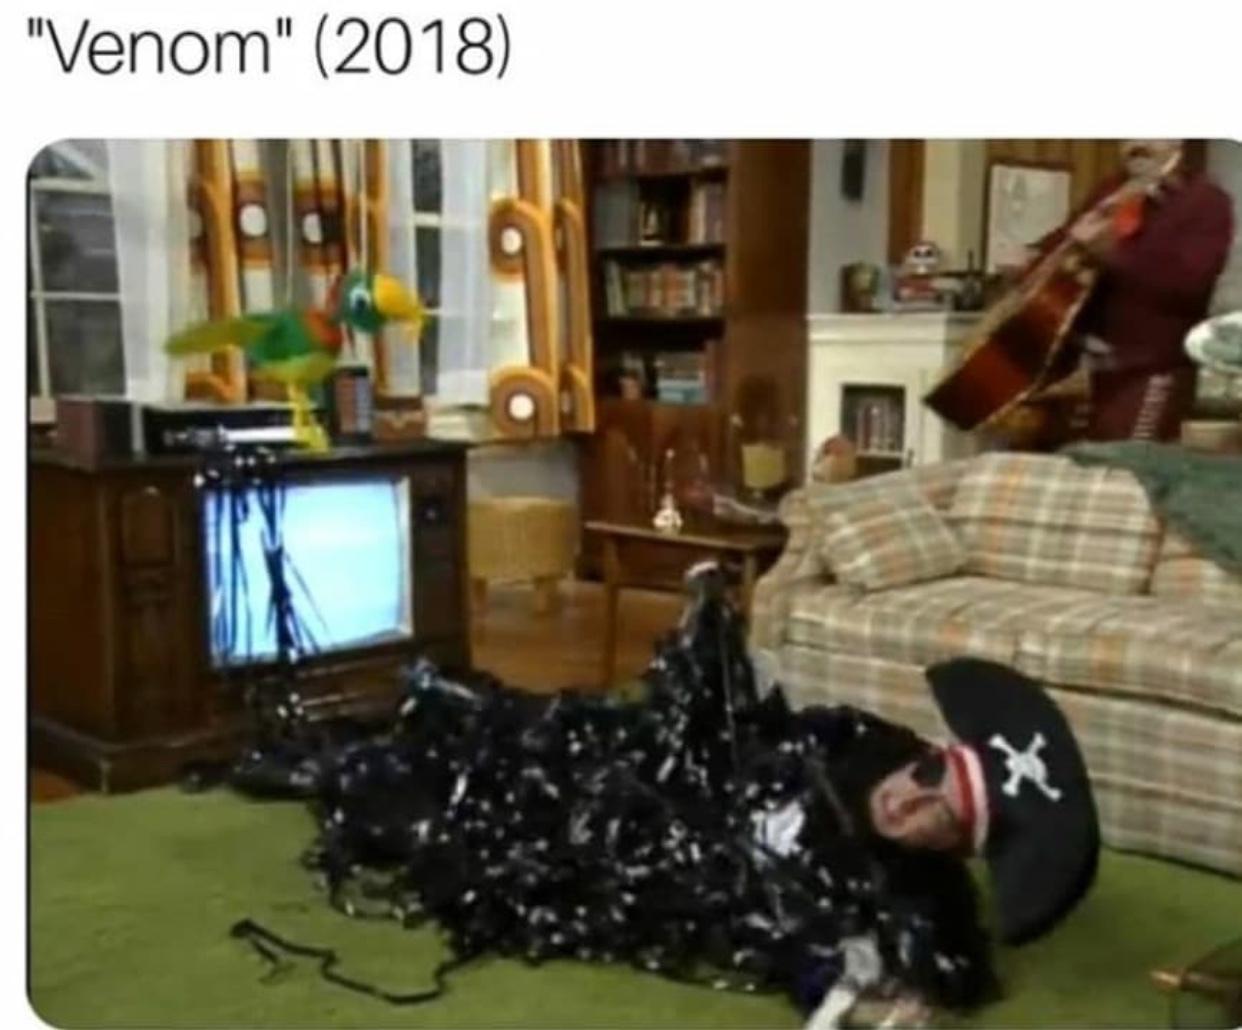 new venom movie looks sick - meme